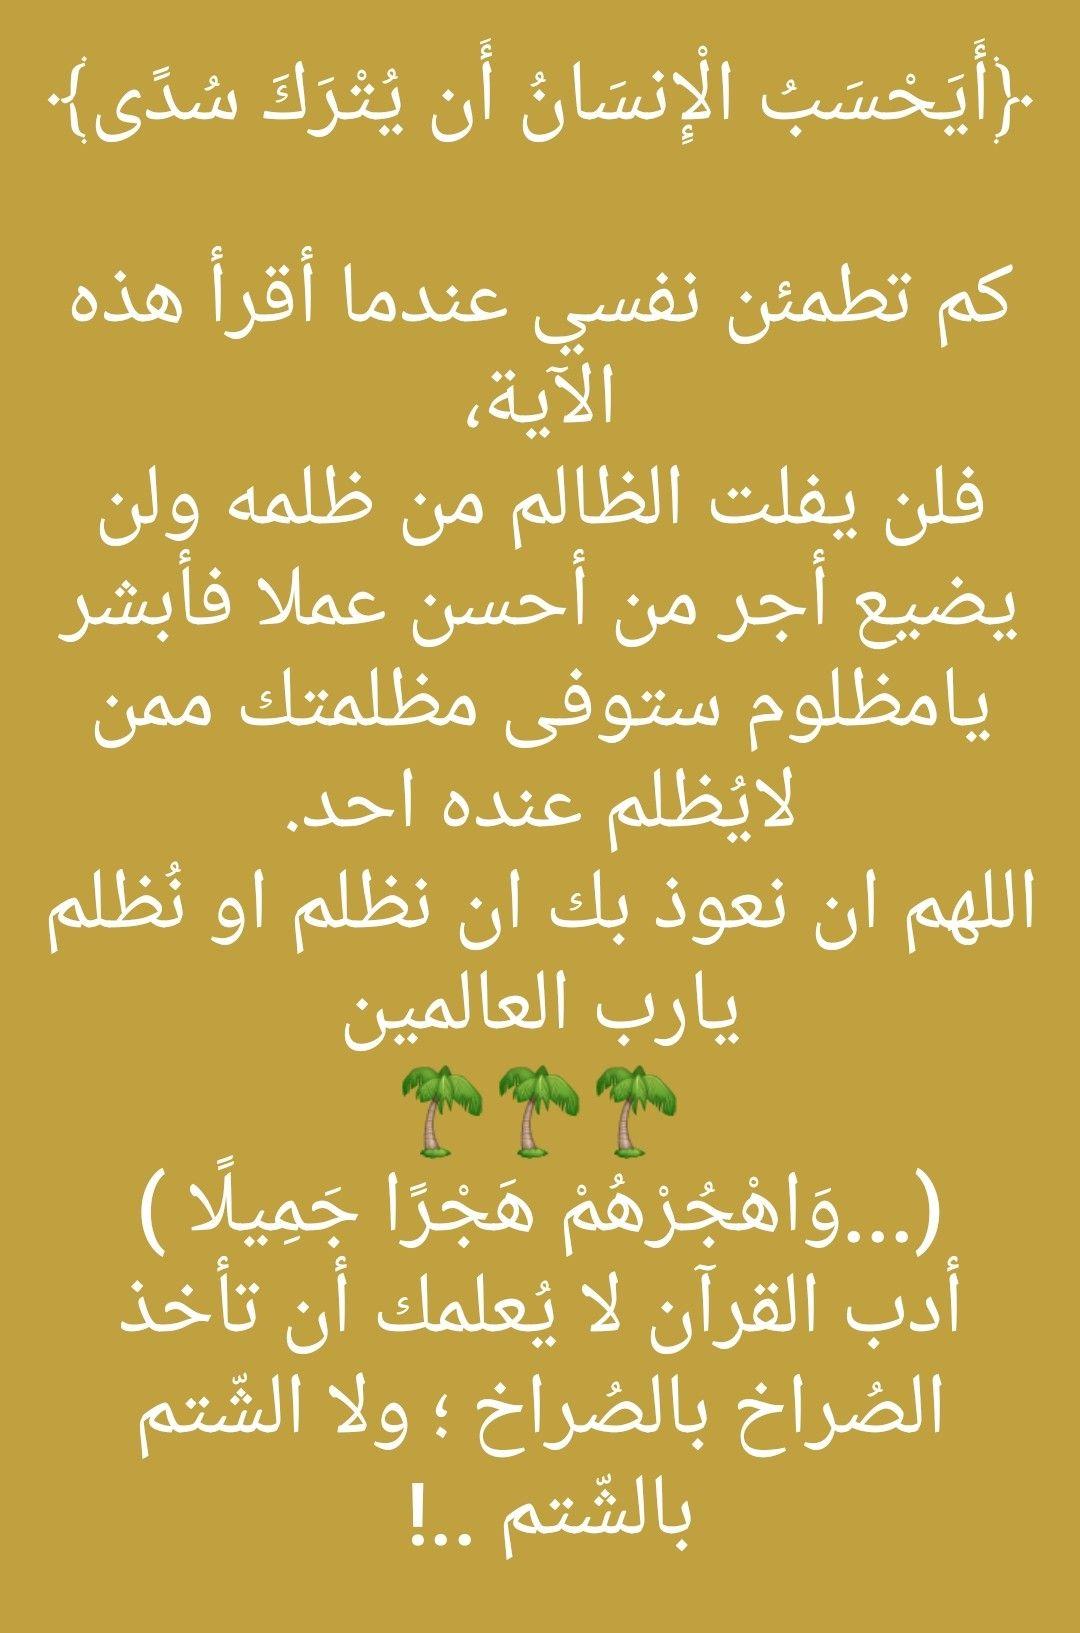 Pin By Naminas On Stores Quotes Holy Quran Sayings